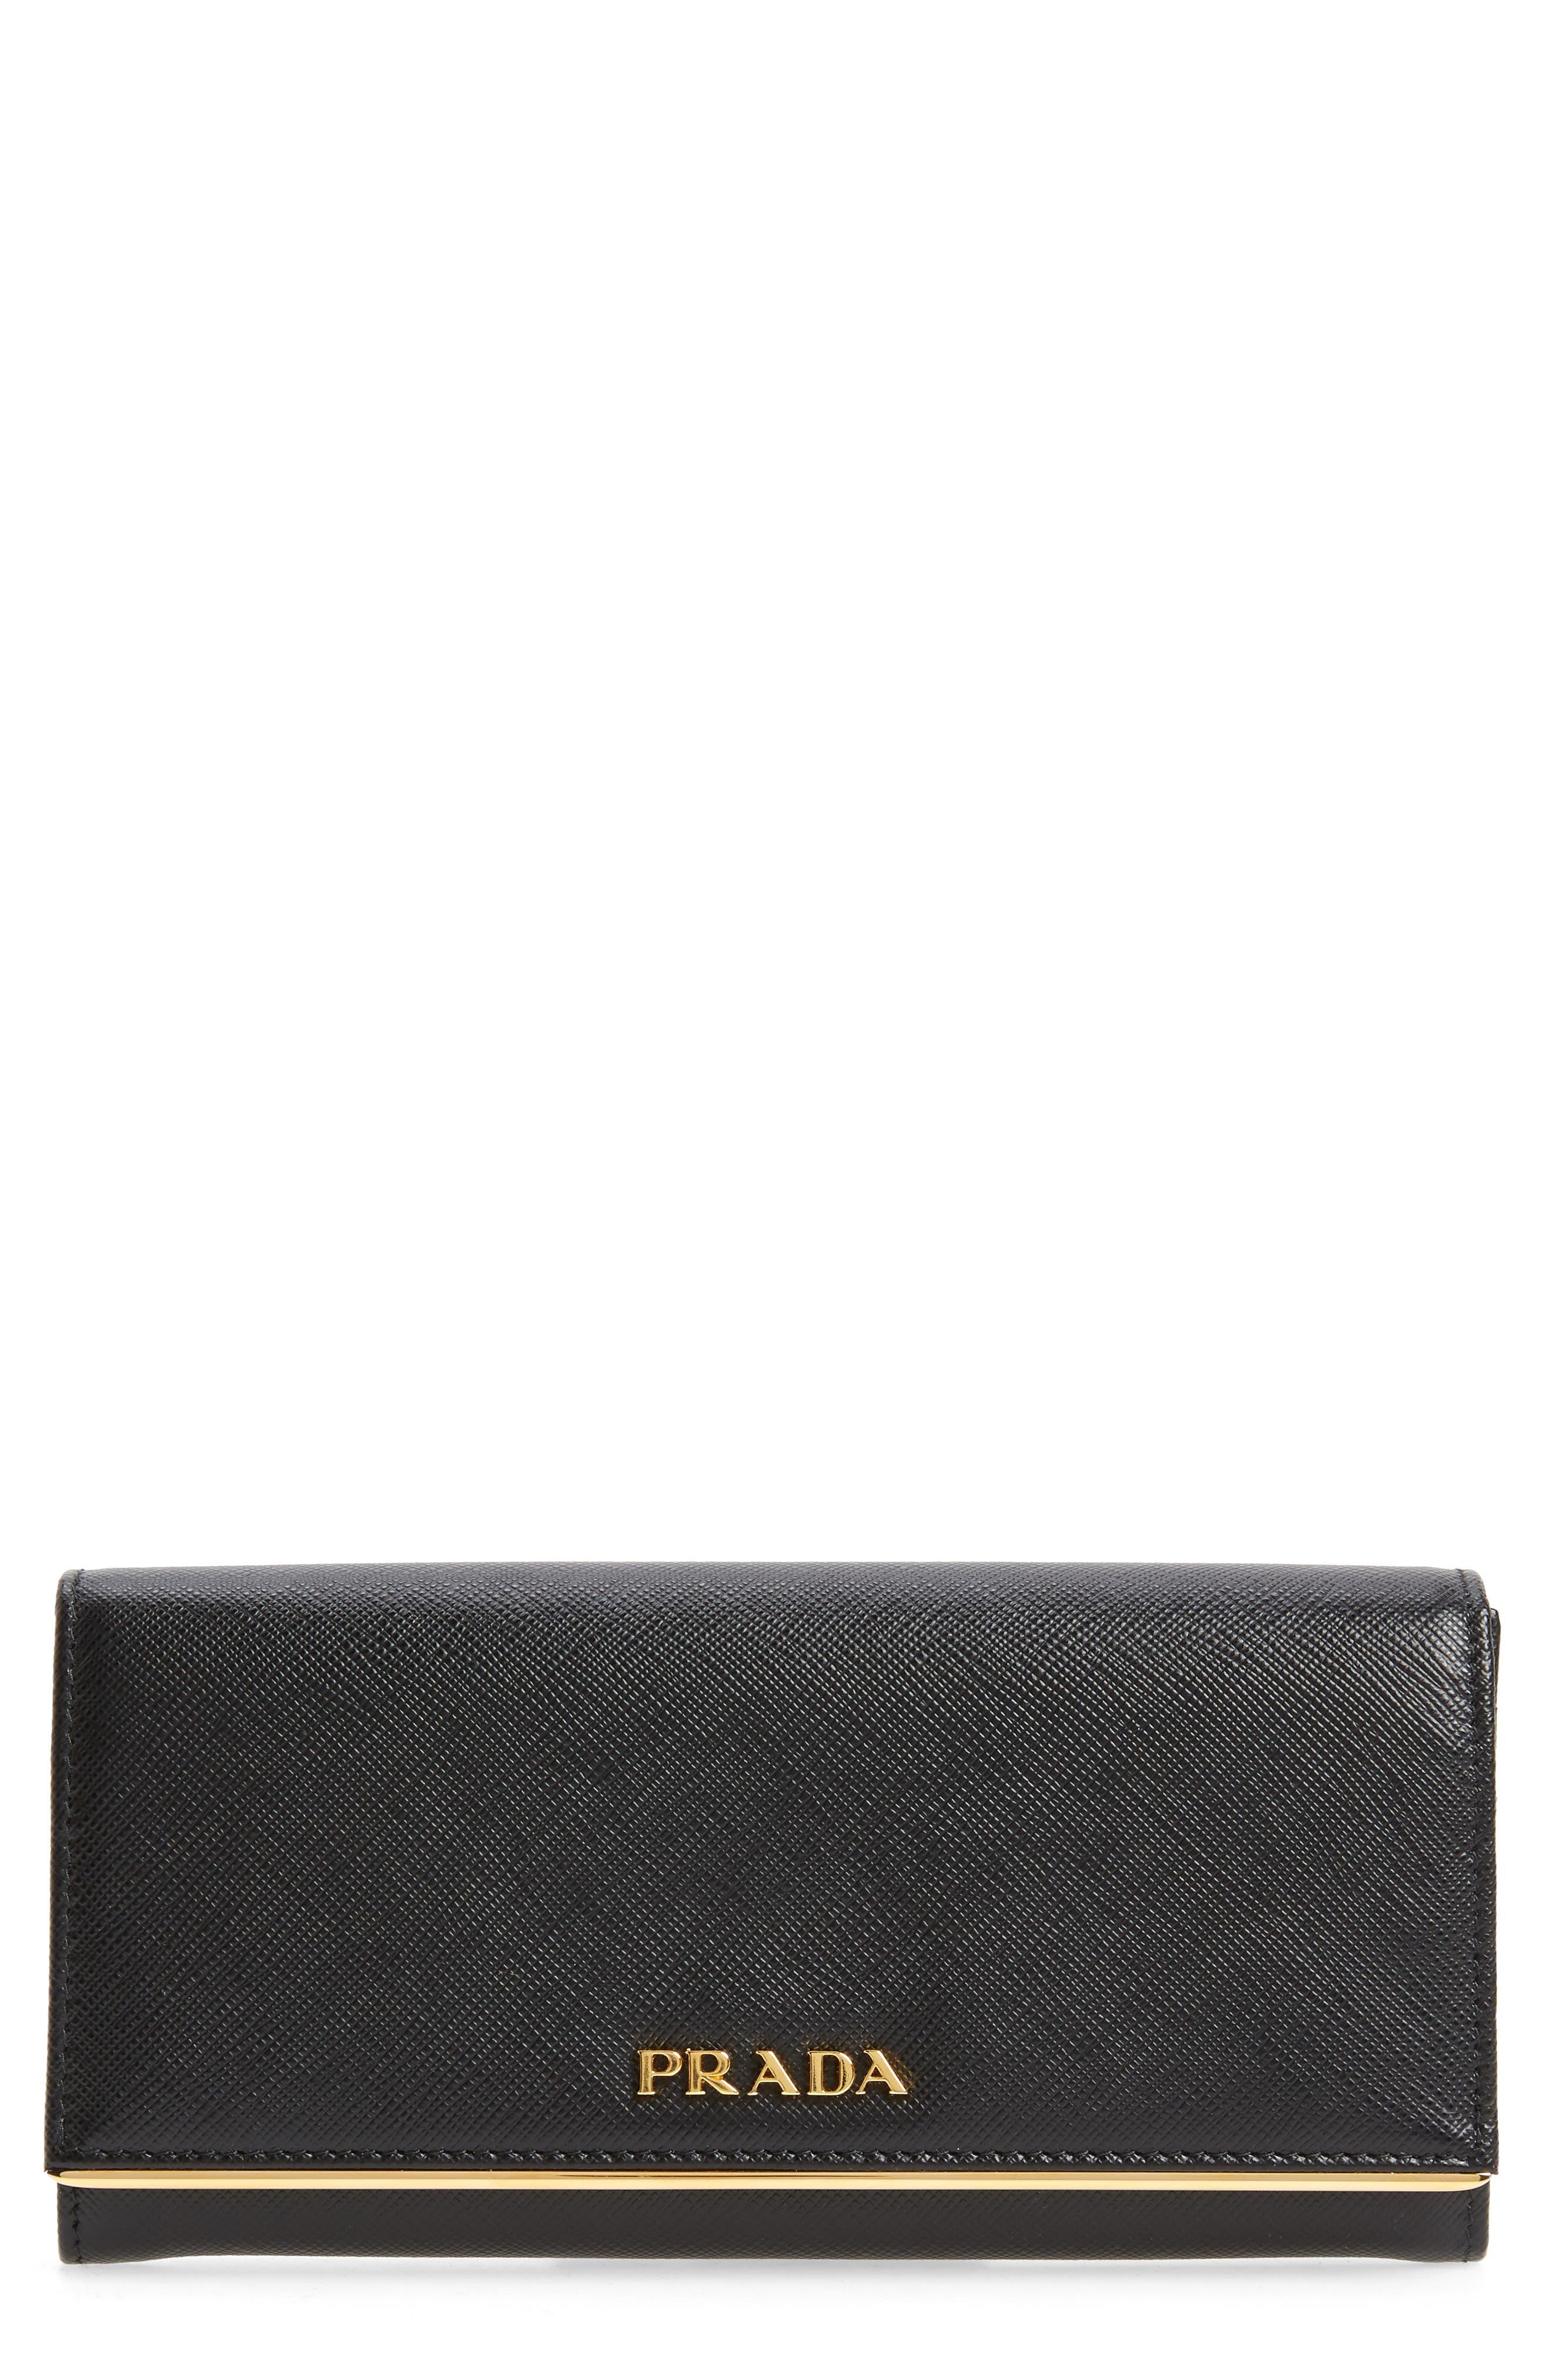 Metal Bar Saffiano Leather Continental Wallet,                             Main thumbnail 1, color,                             001